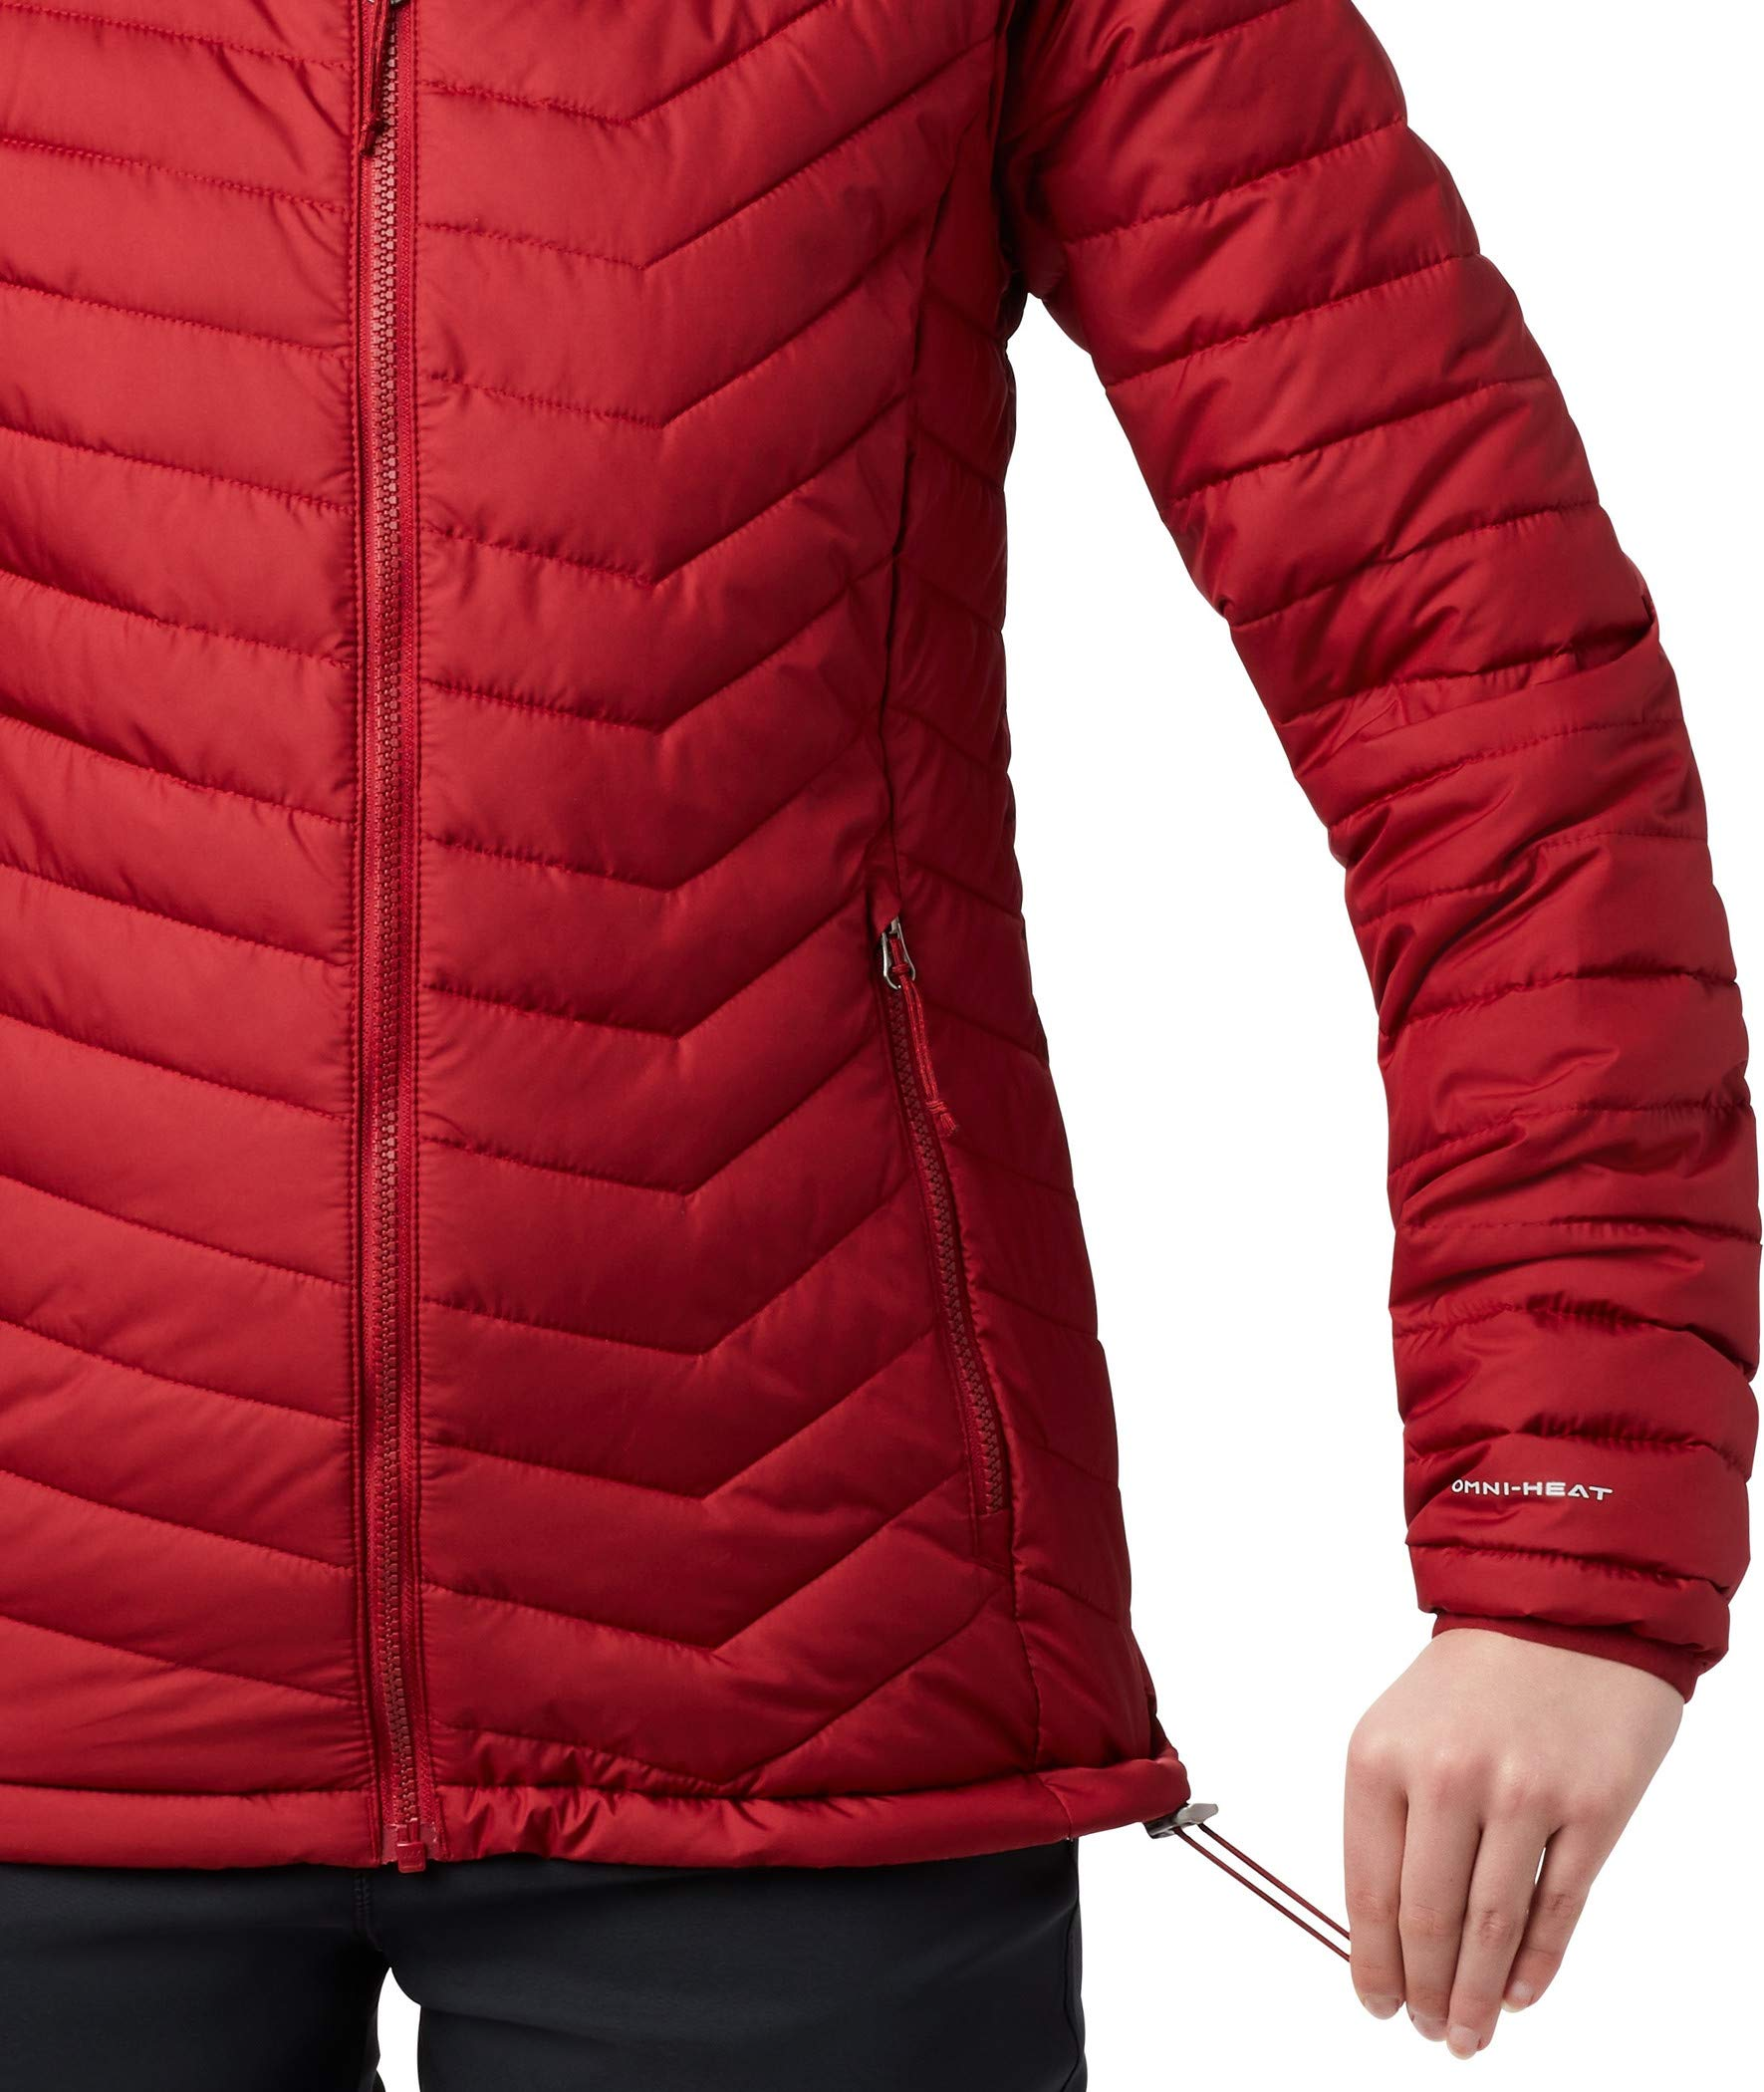 71fTXrlGTCL - Columbia Women's Powder Lite Jacket